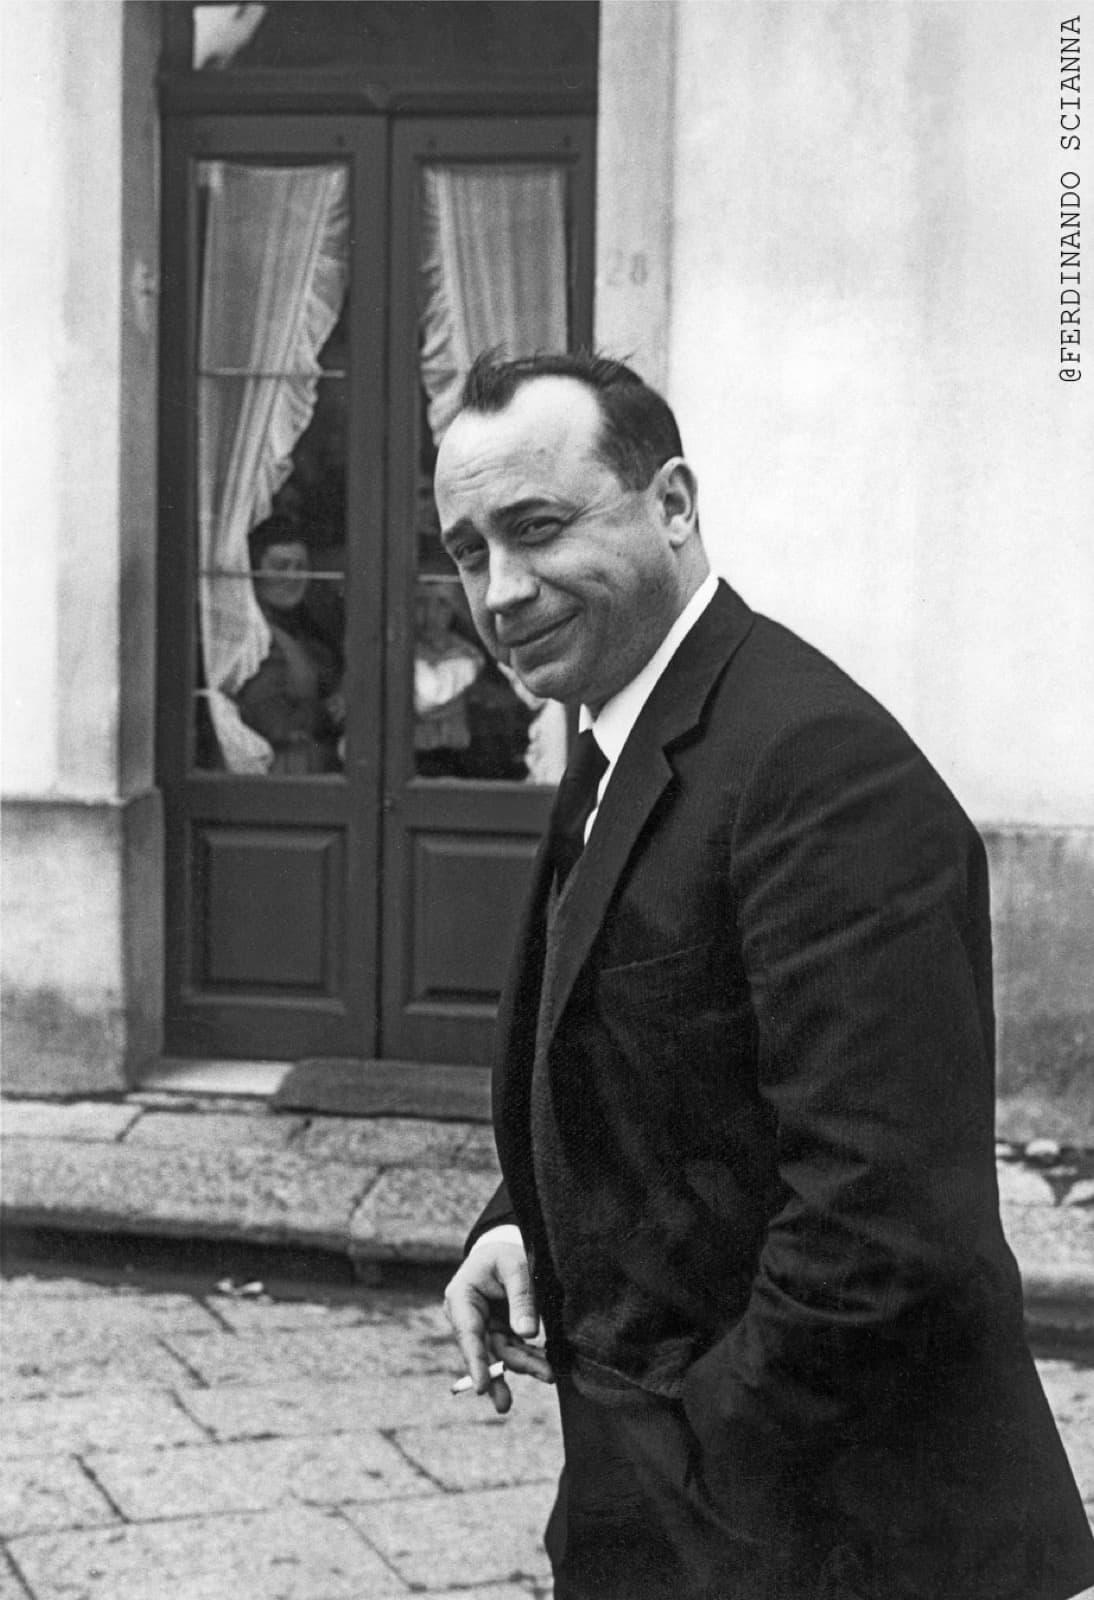 Ferdinando Scianna, Italian Writer Leonardo Sciascia © Magnum Photos; ColornoPhotoLife